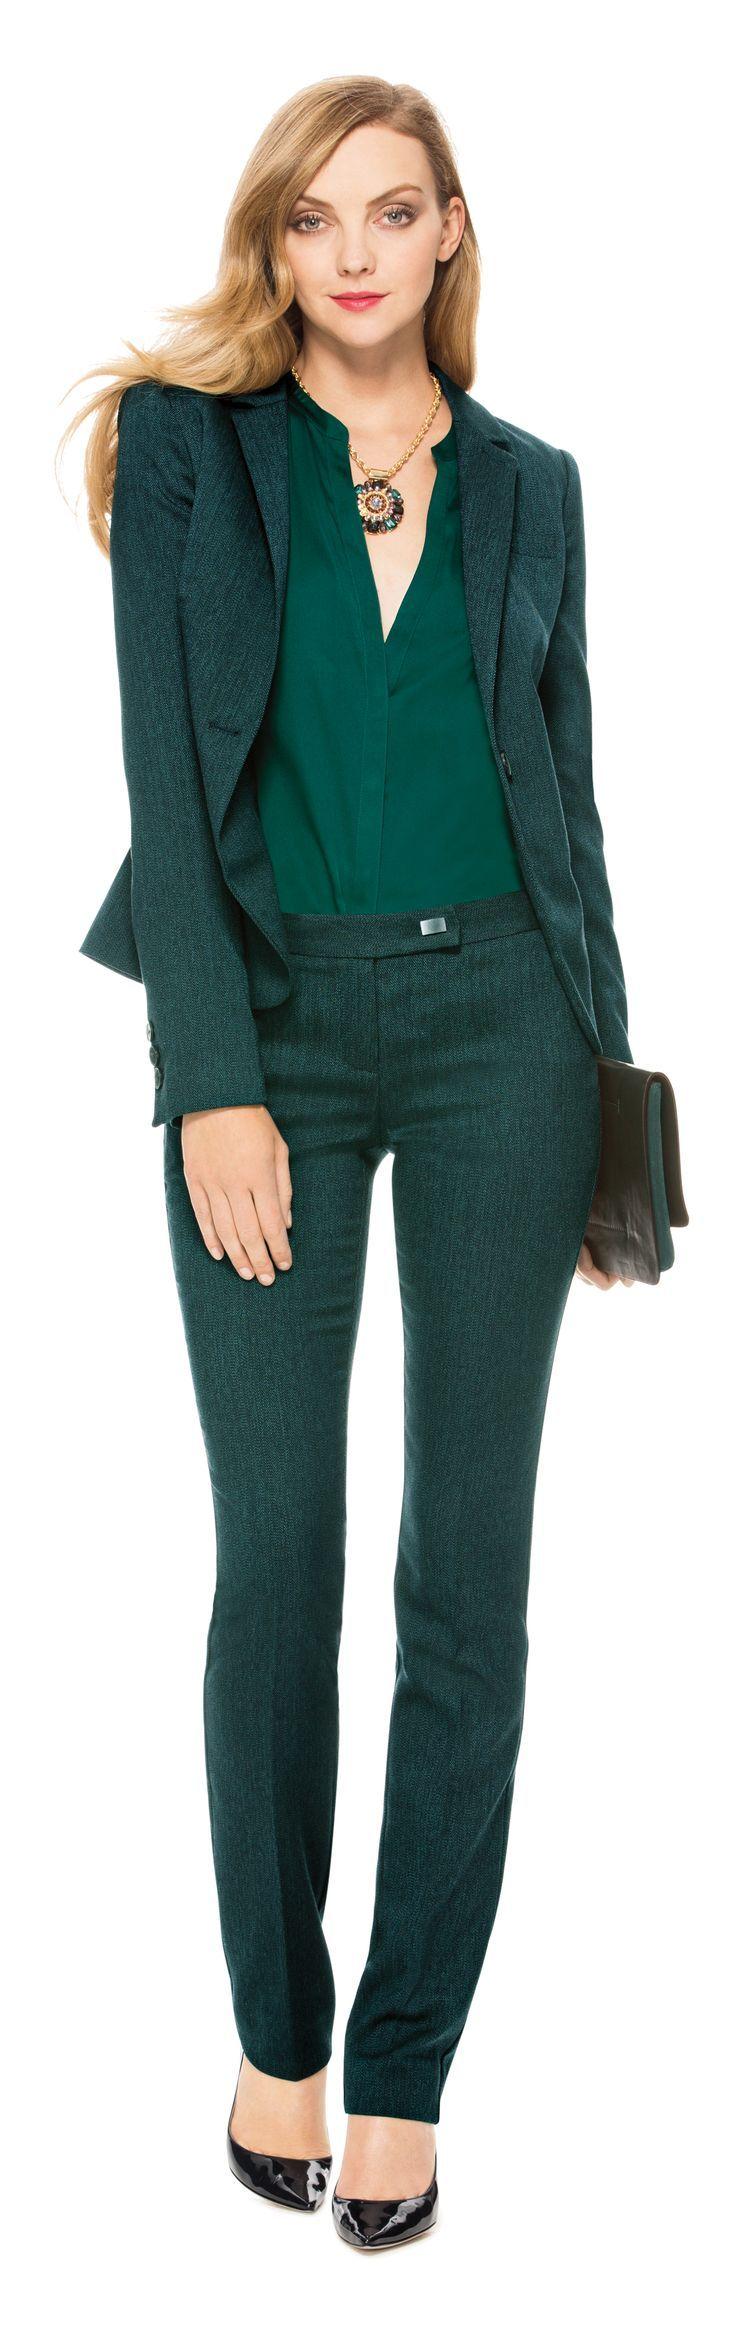 Fall / Winter - office wear - work outfit - deep green suit + emerald green silk v-neck blouse + black stilettos + black clutch